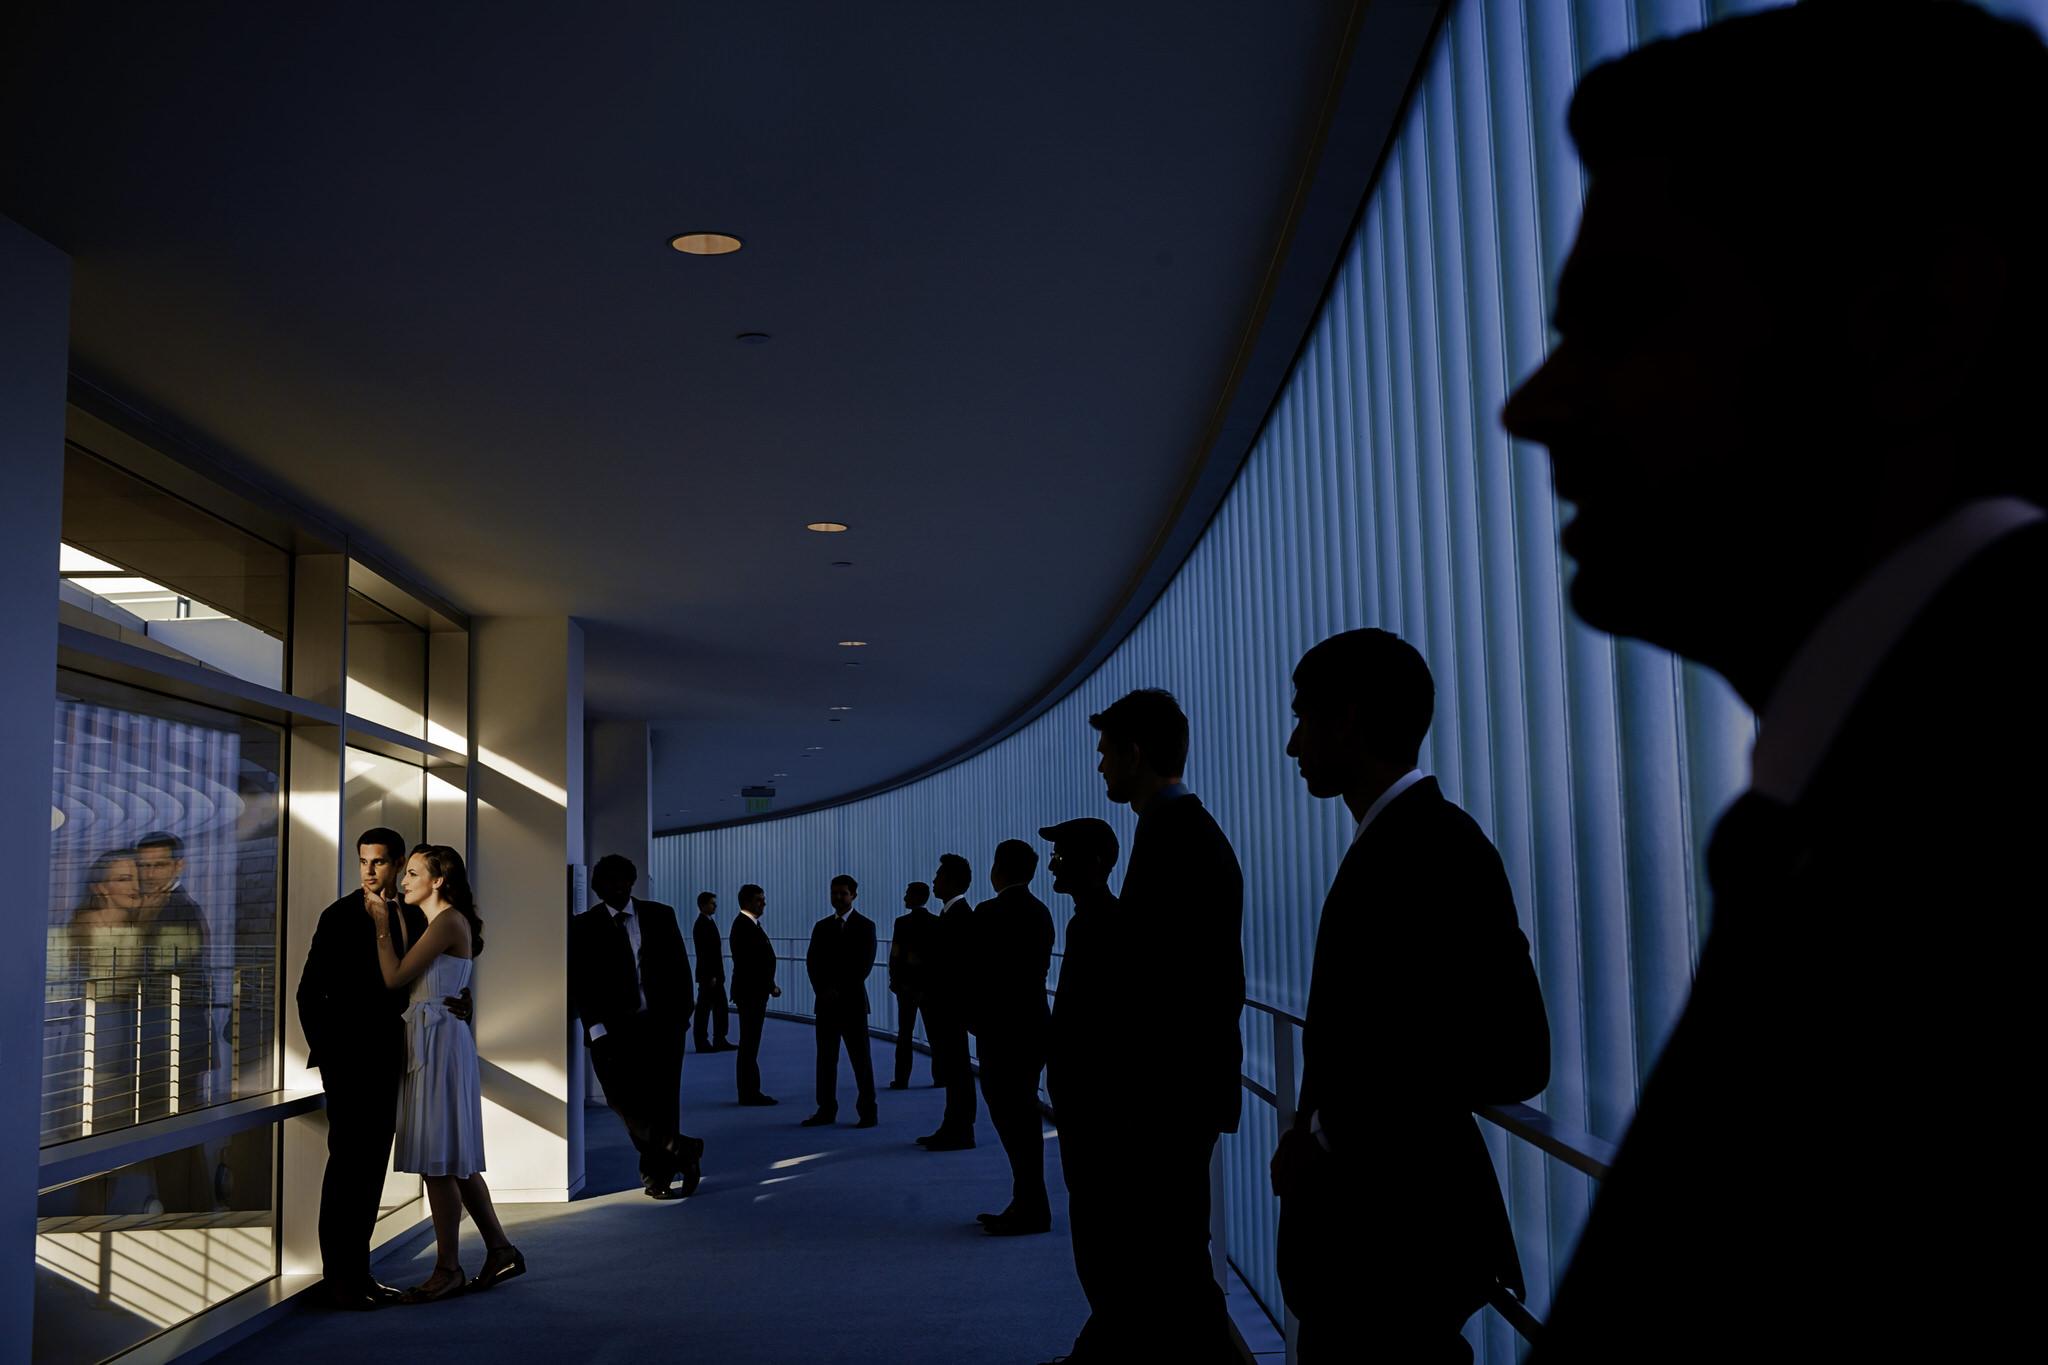 Lauran and Shyam's wedding at the San Jose City Hall in San Jose, California.